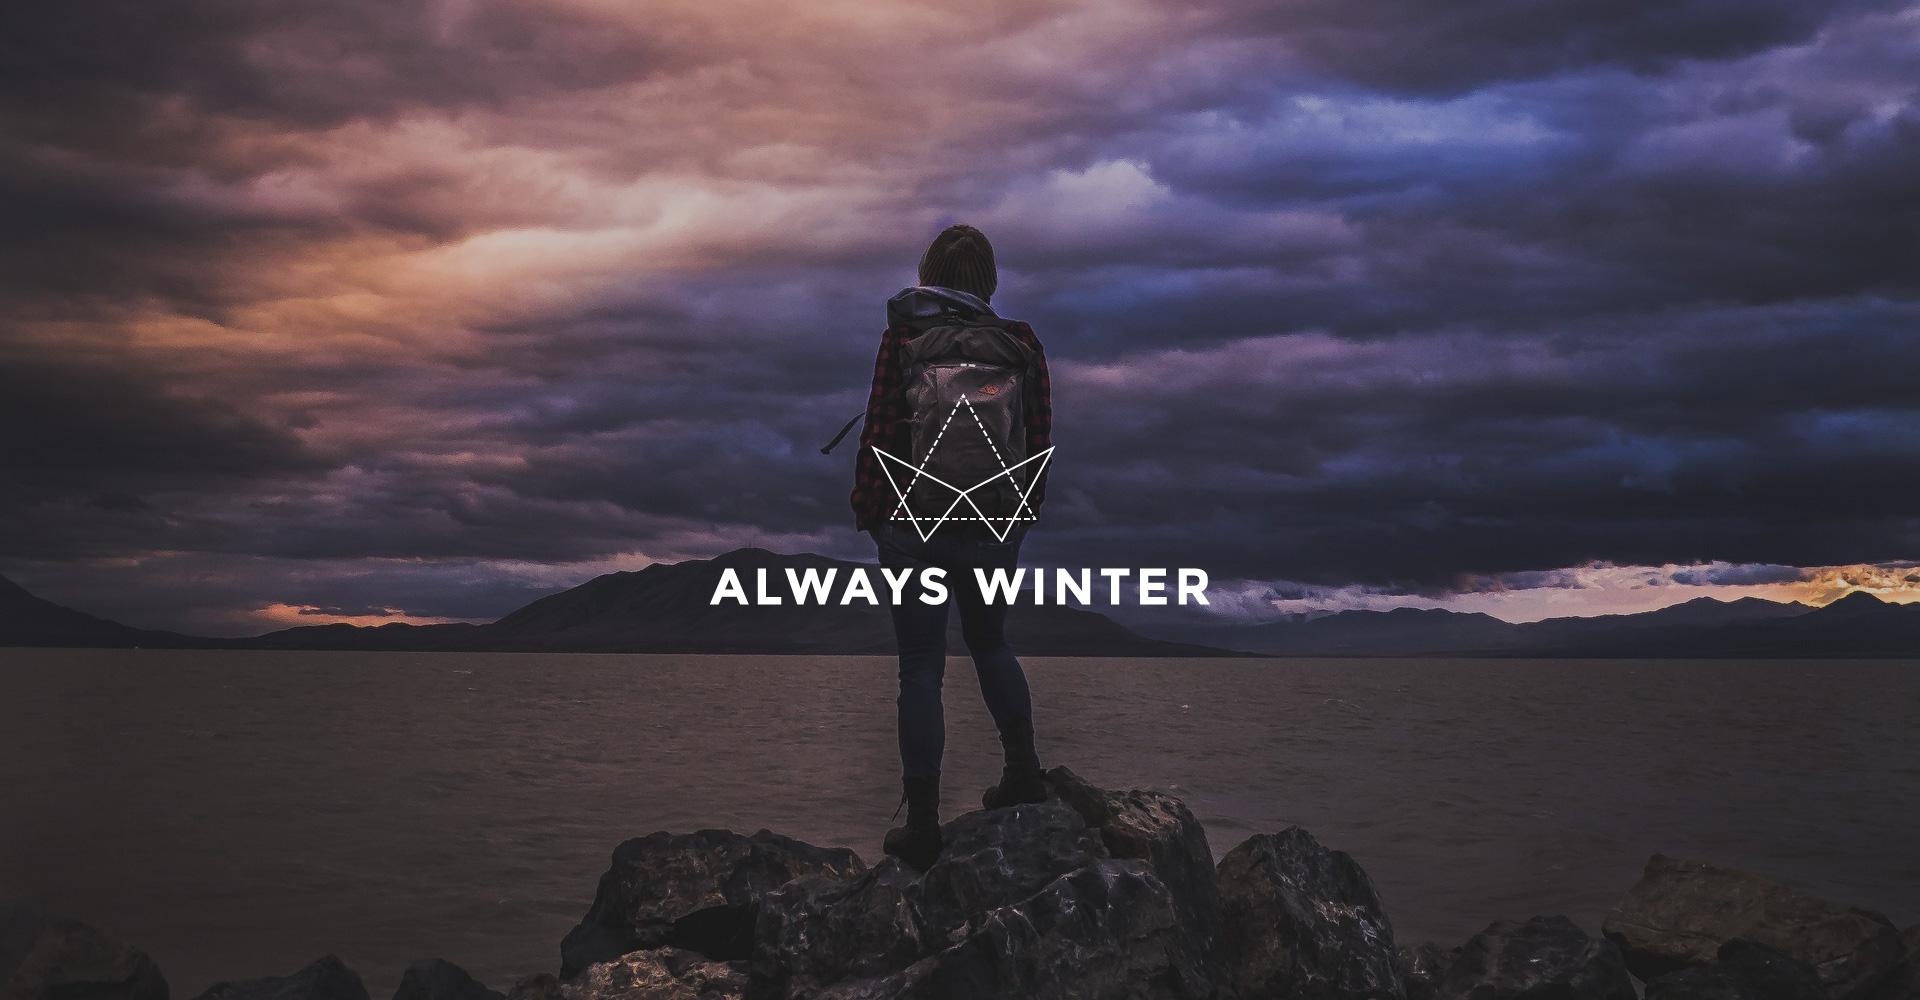 AlwaysWinter_Icon_background_001_1920x1000